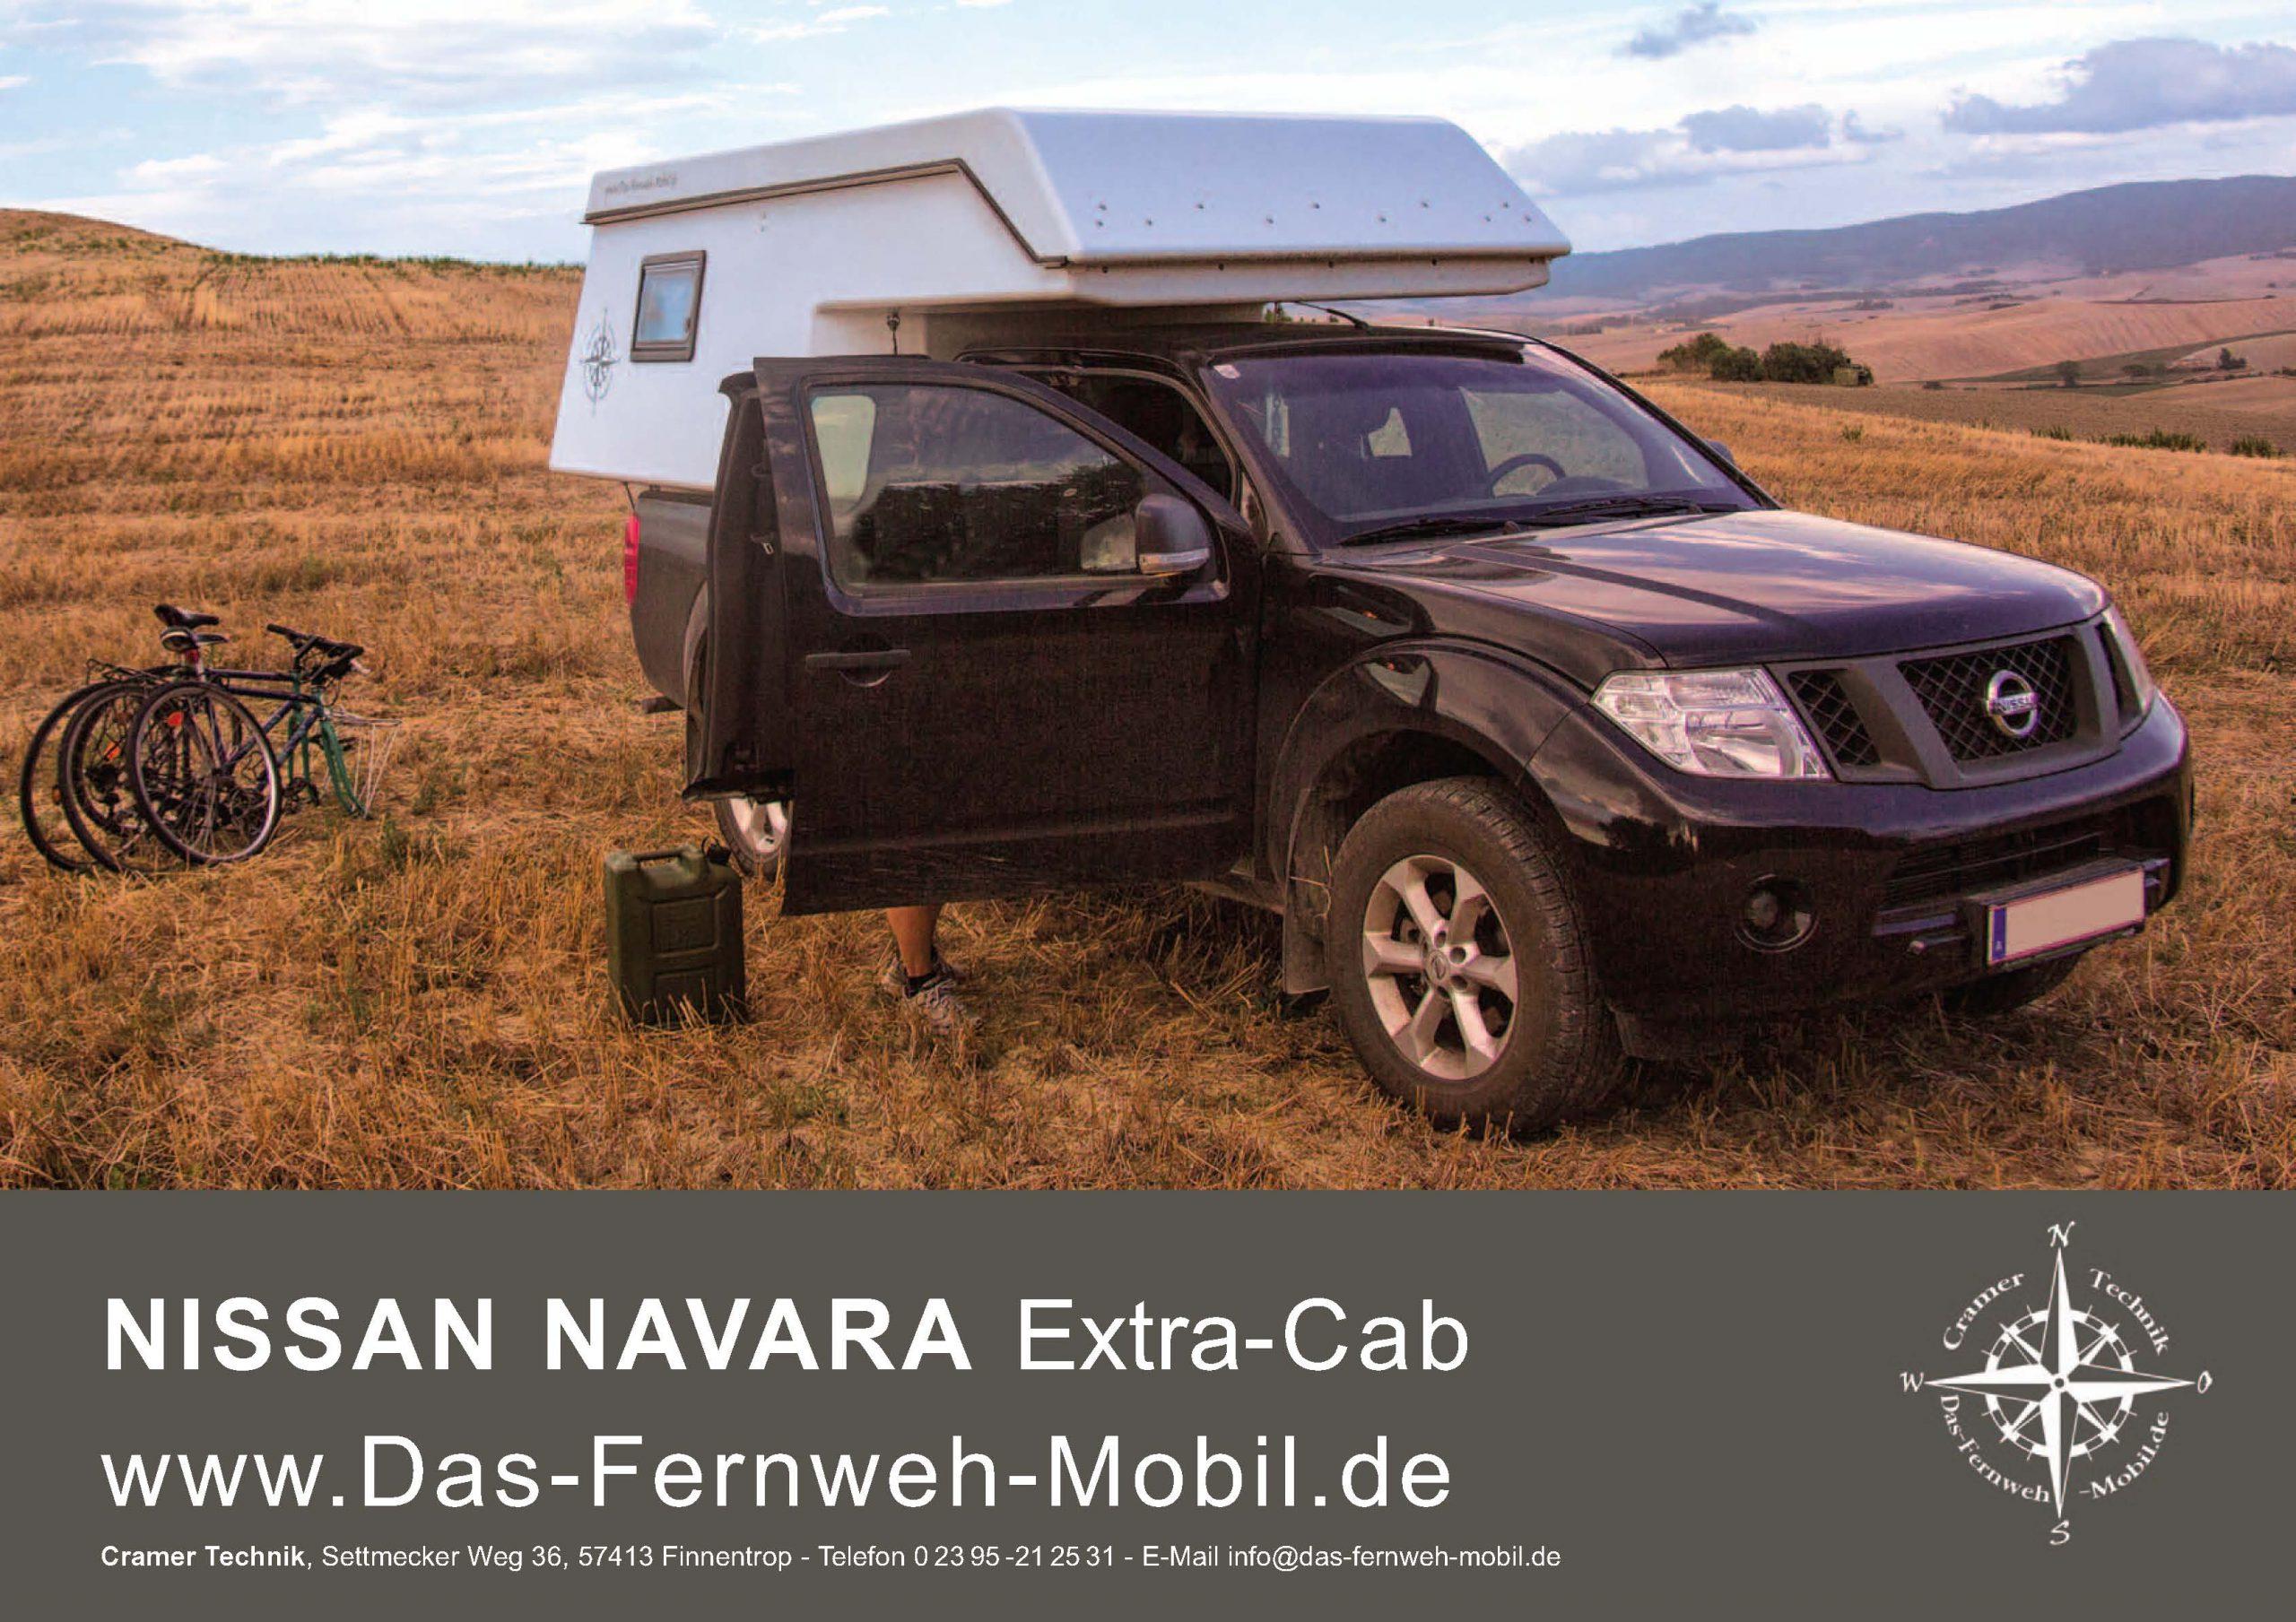 Datenblatt-Nissan-Navara-Extra-Cab-102019-k_Seite_1